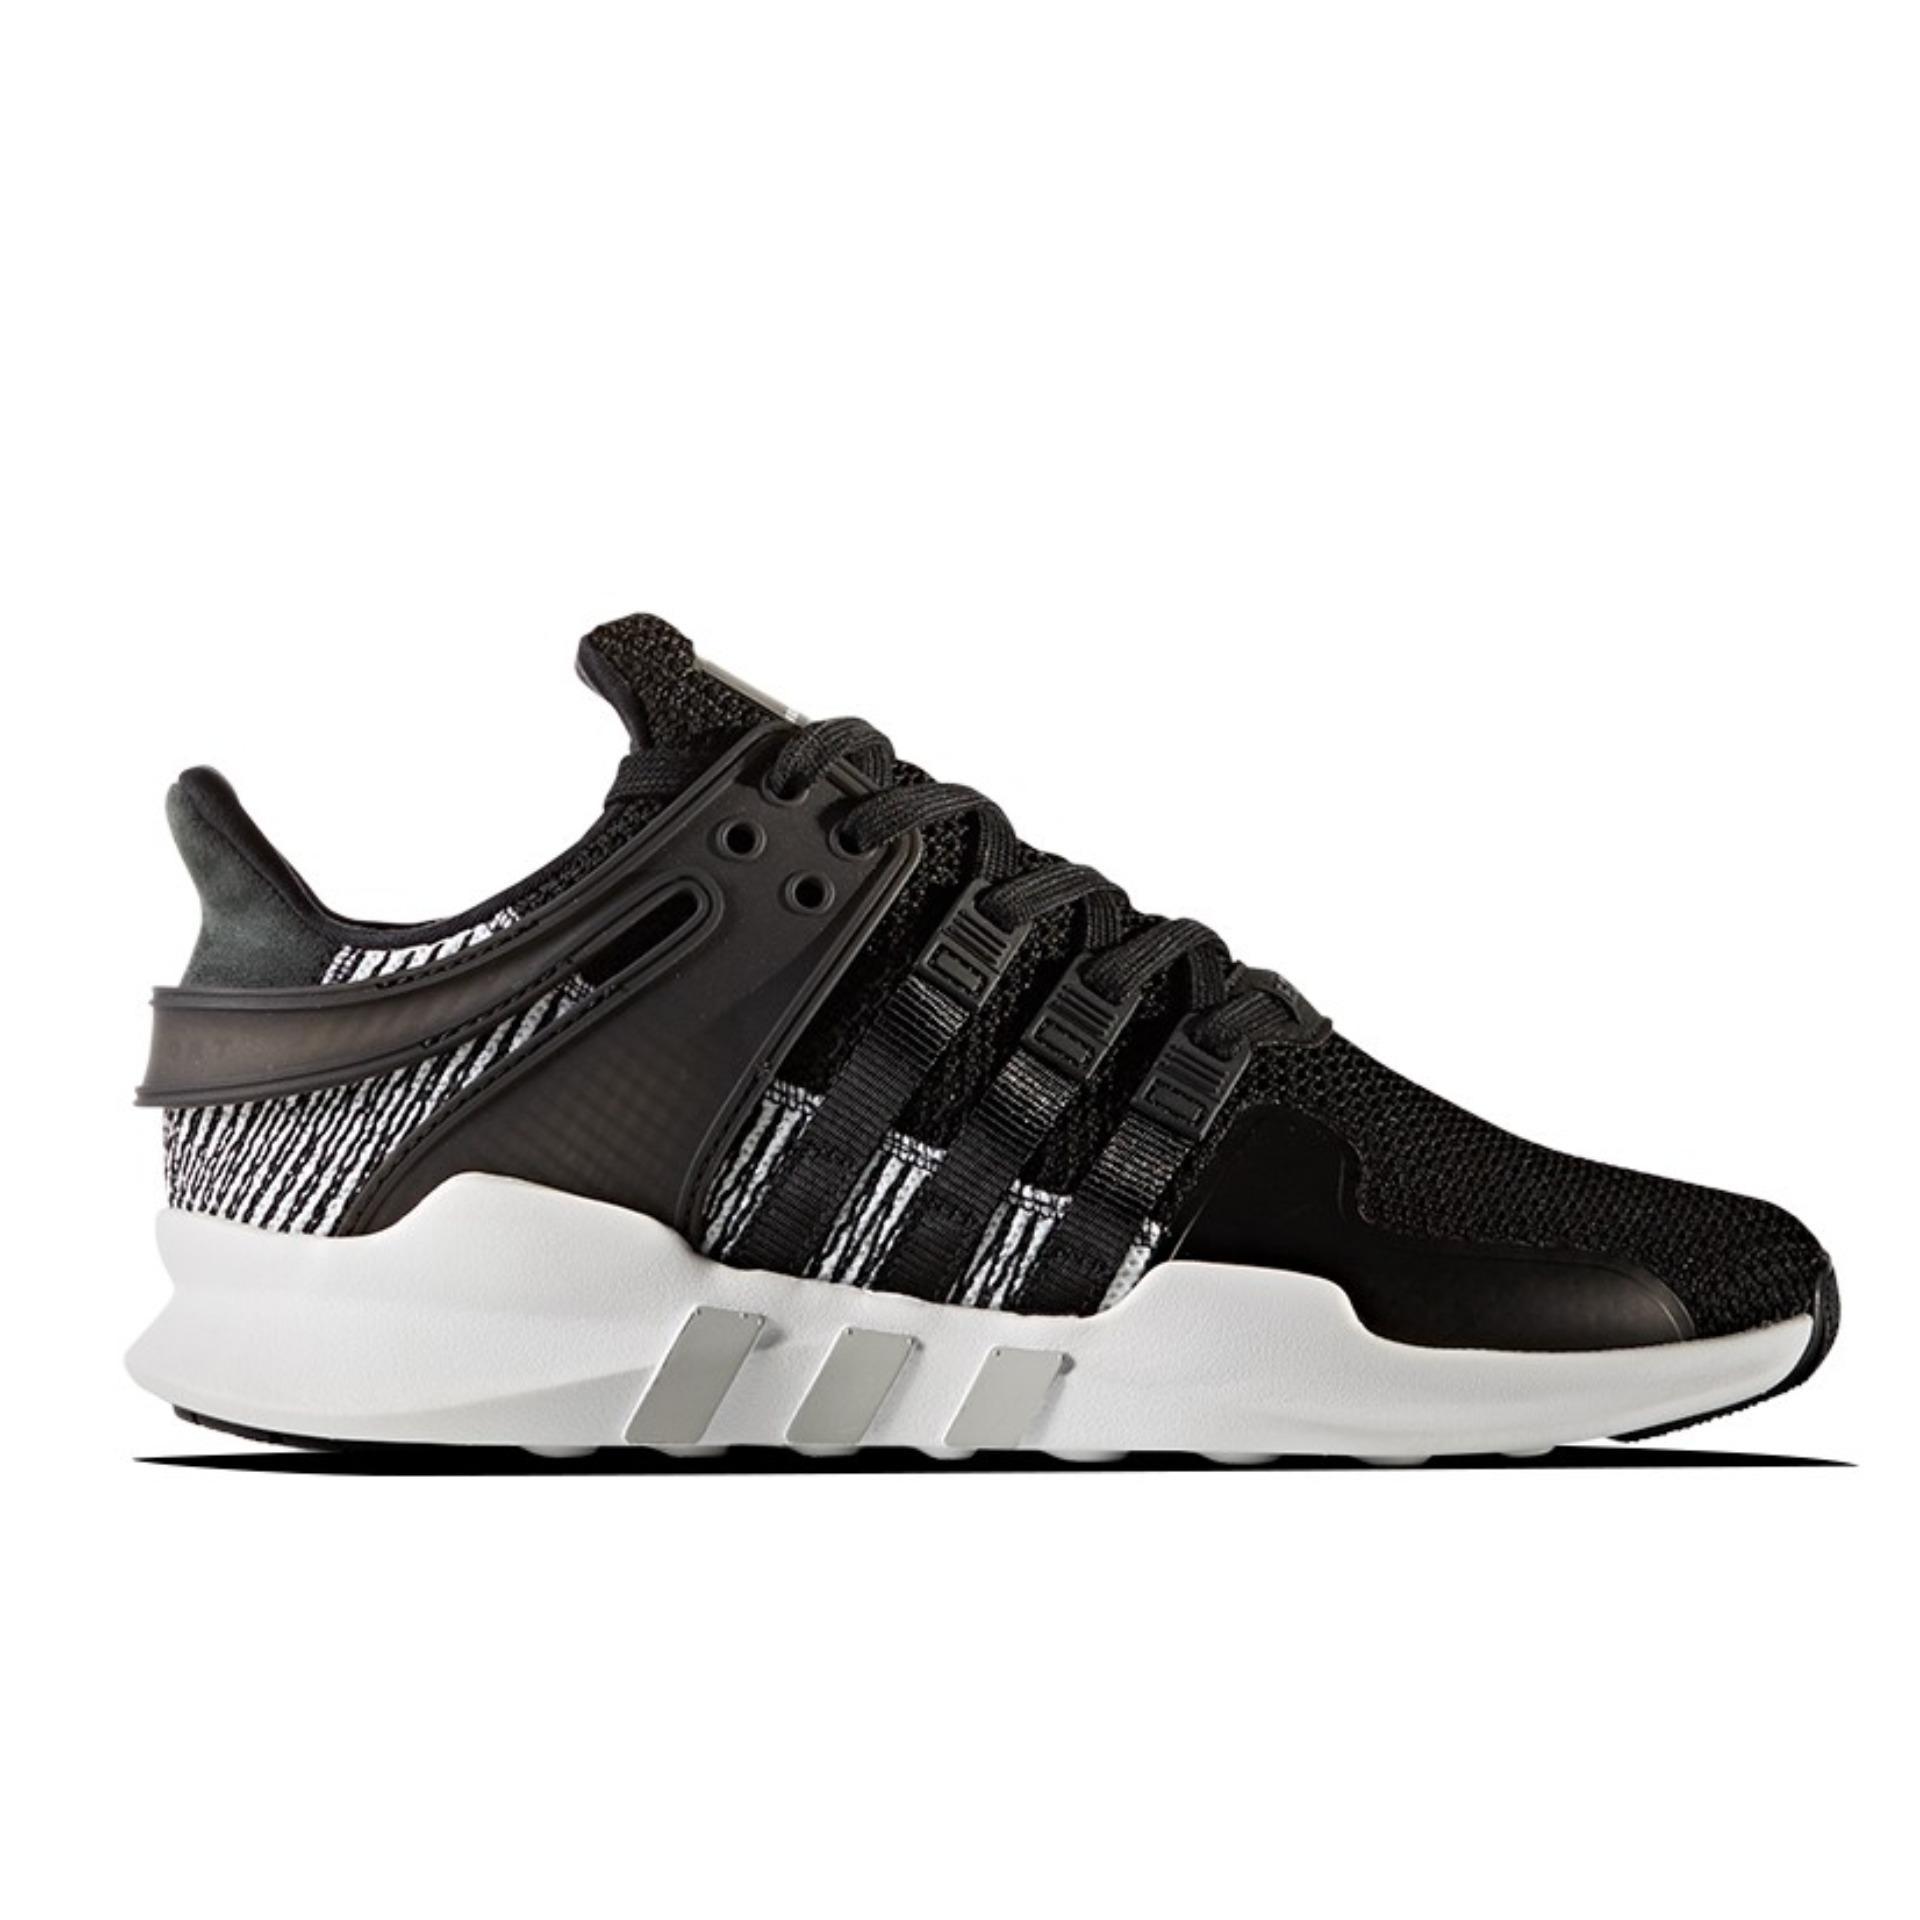 Harga Adidas Sepatu Sneaker Eqt Support Adv By9585 Hitam Adidas Baru